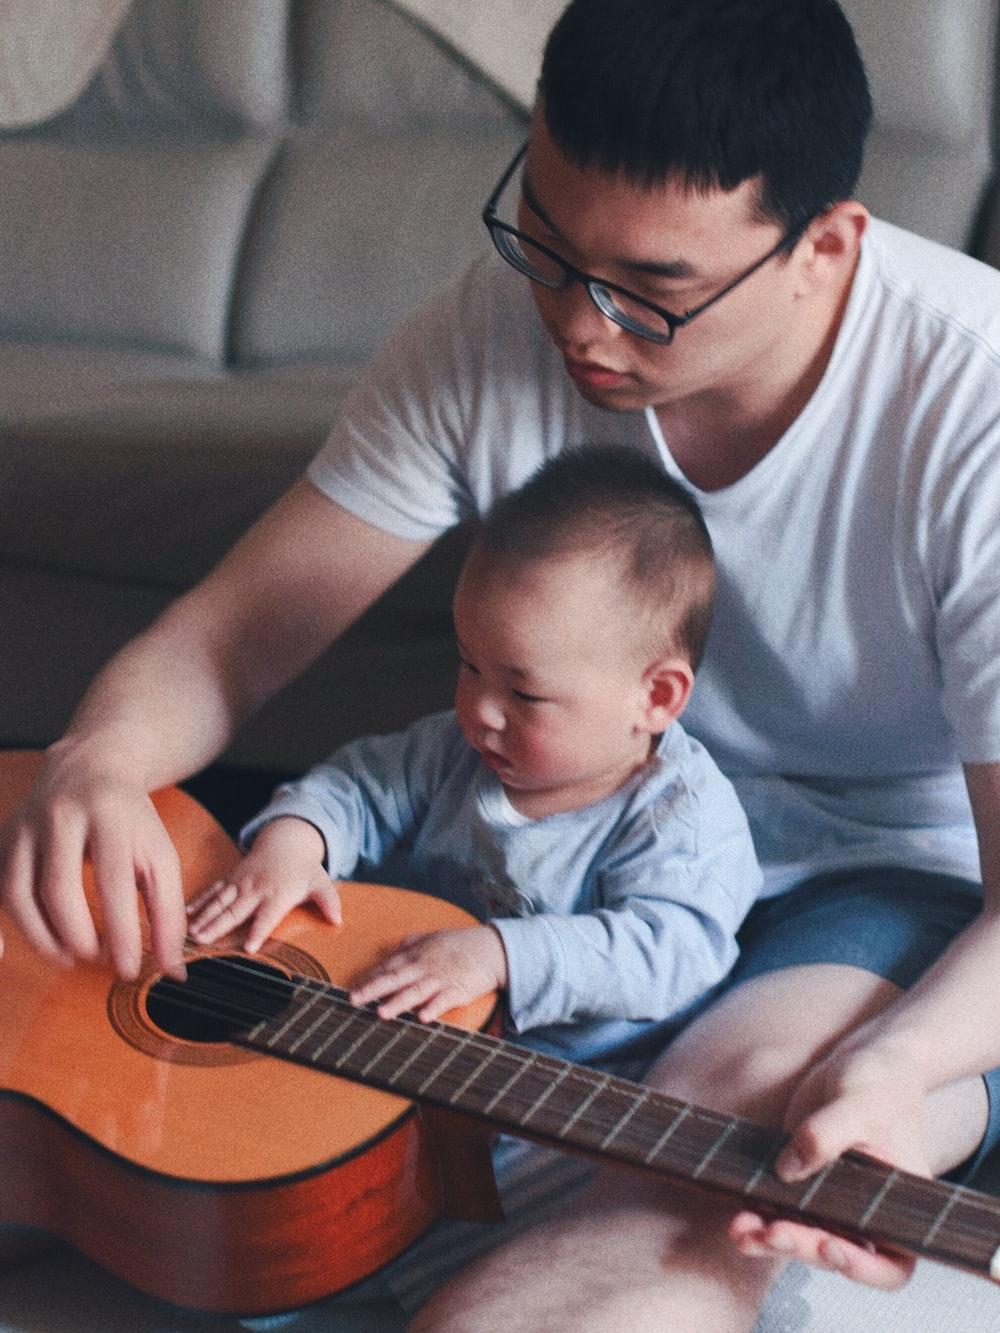 man wearing white crew-neck shirt beside baby holding guitar